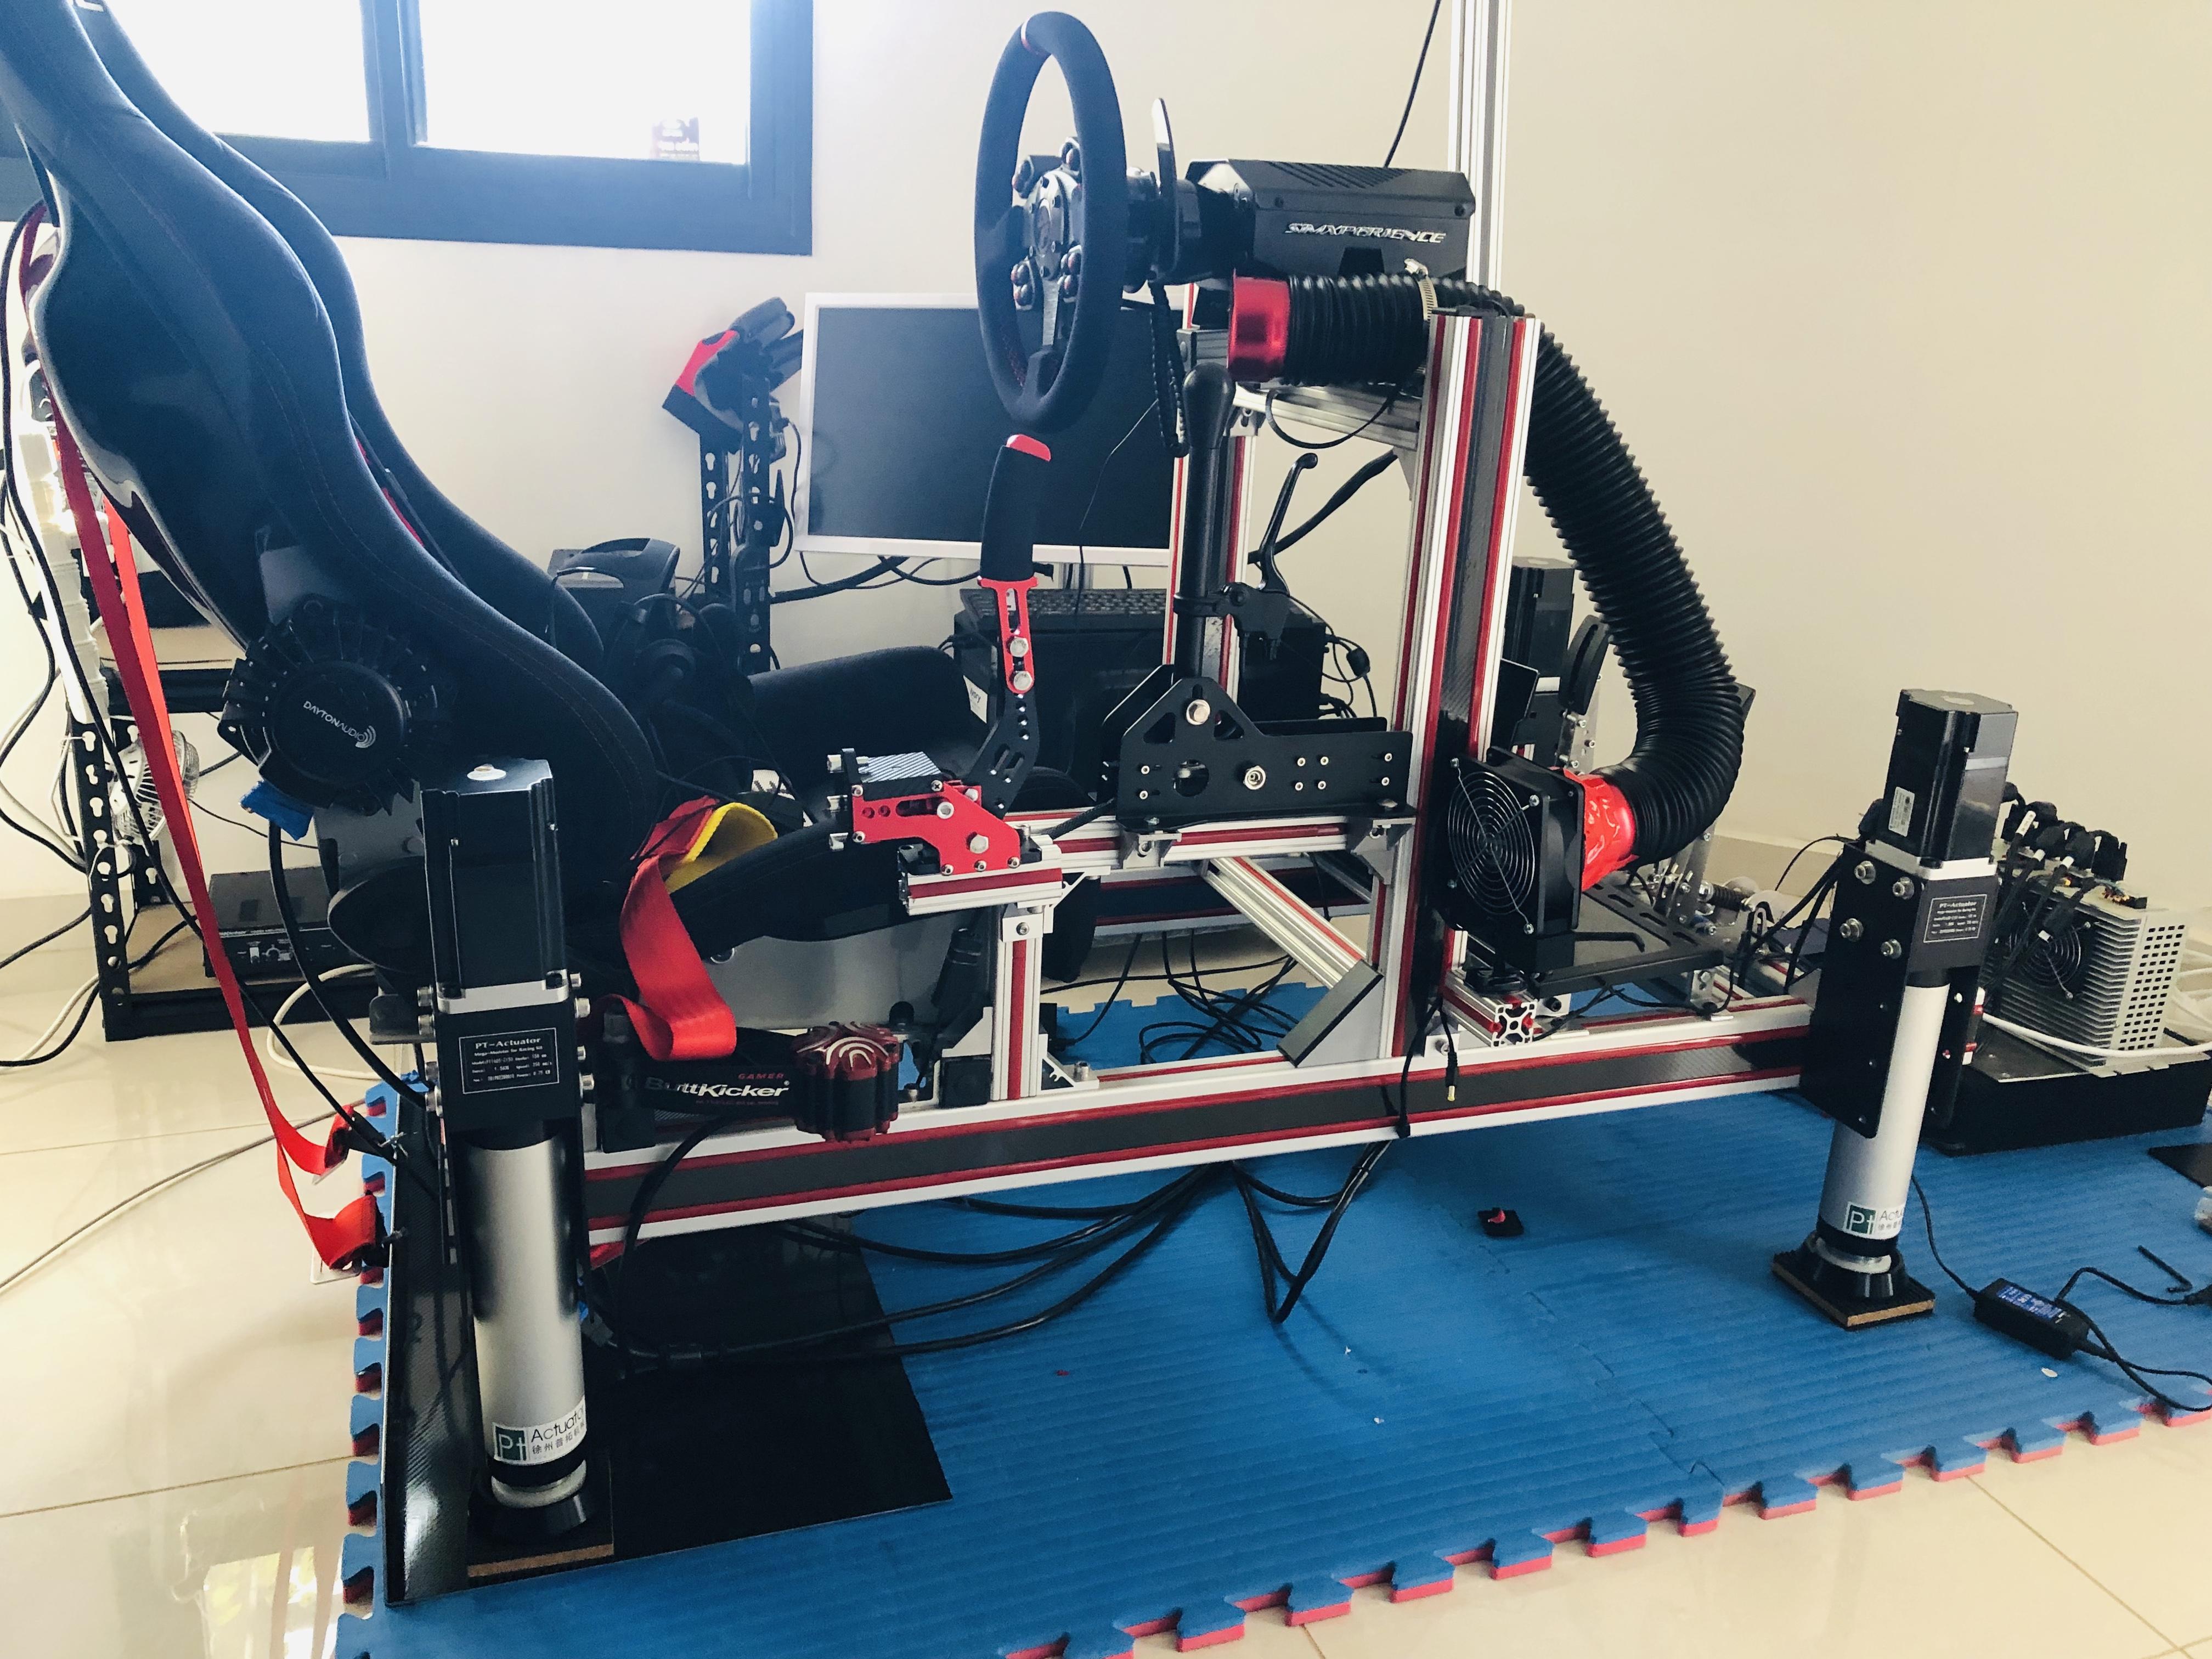 My new motion VR cockpit | Studio-397 Forum